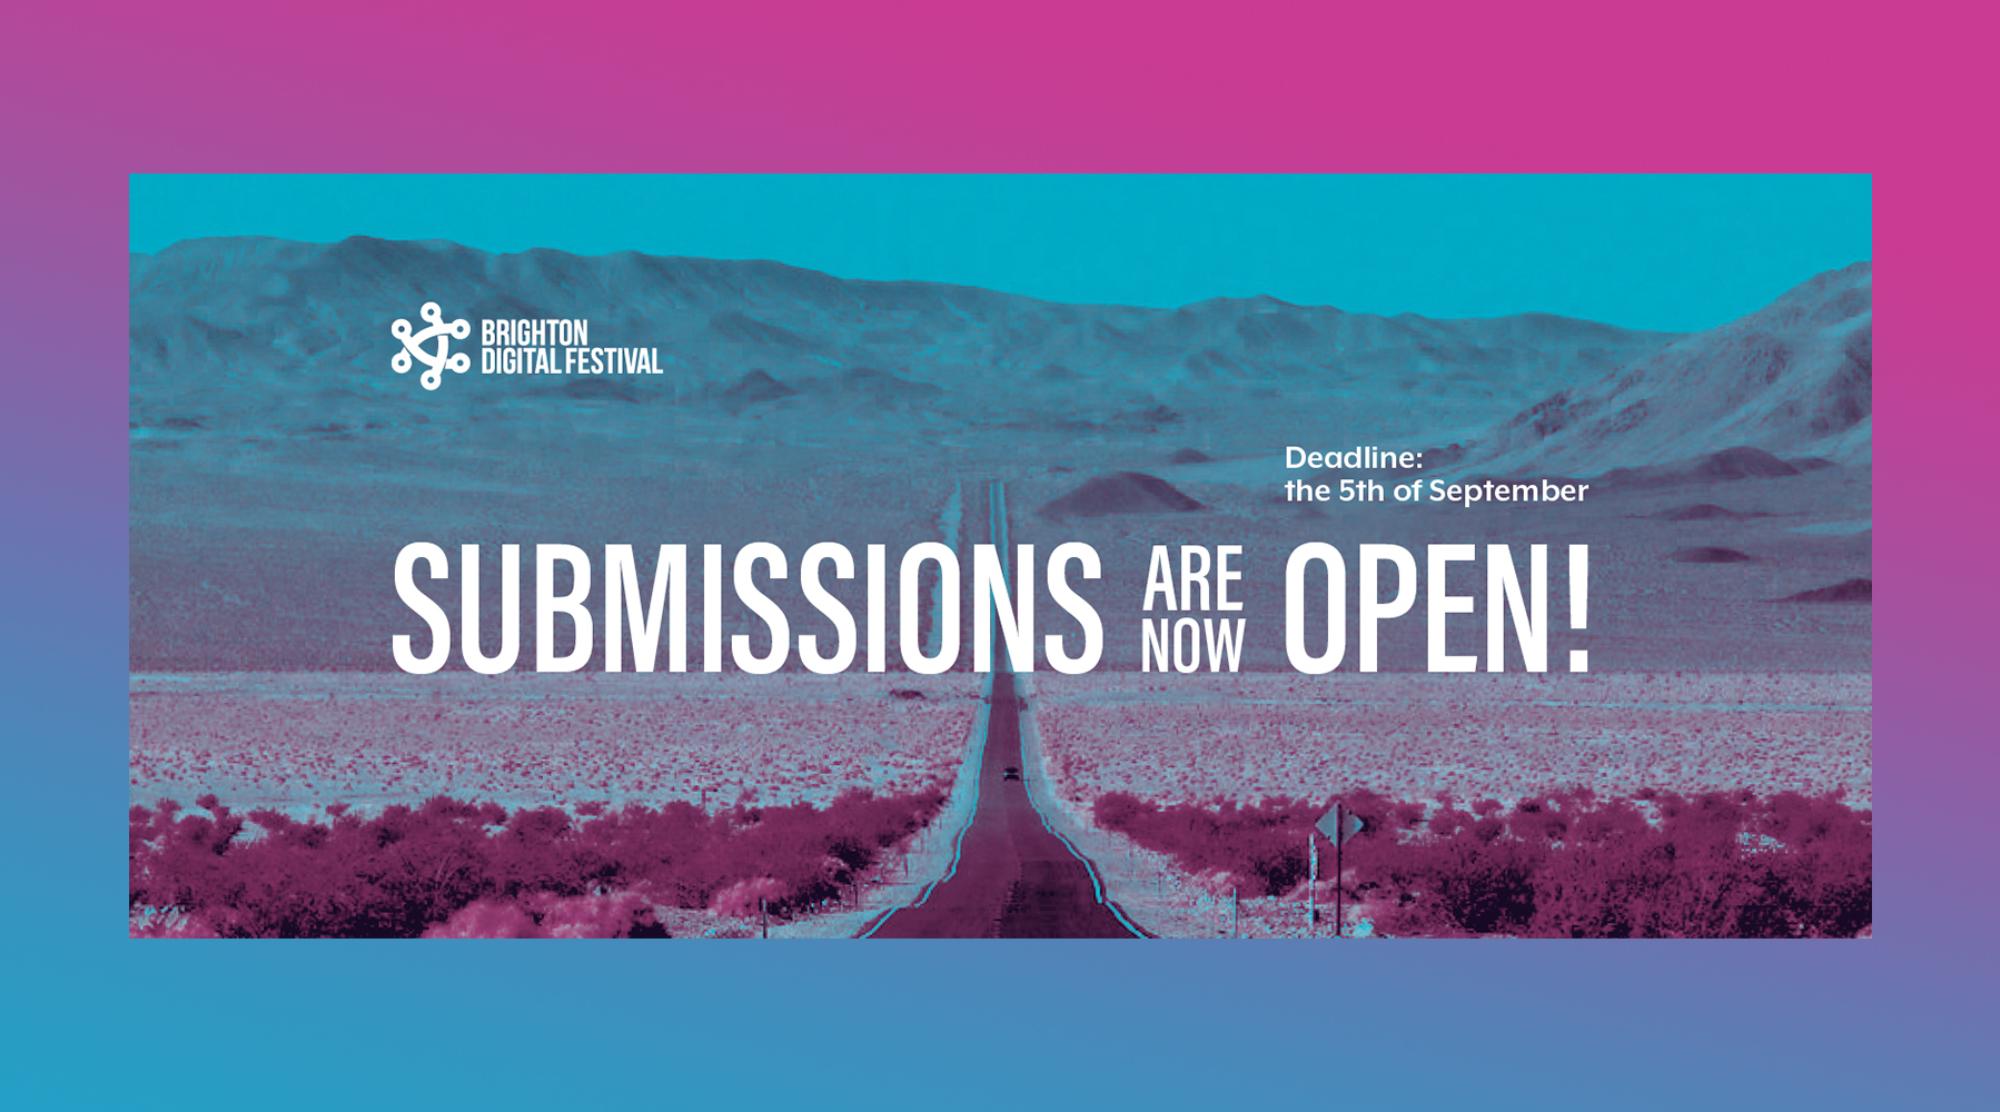 Submissions for Brighton Digital Festival 2021